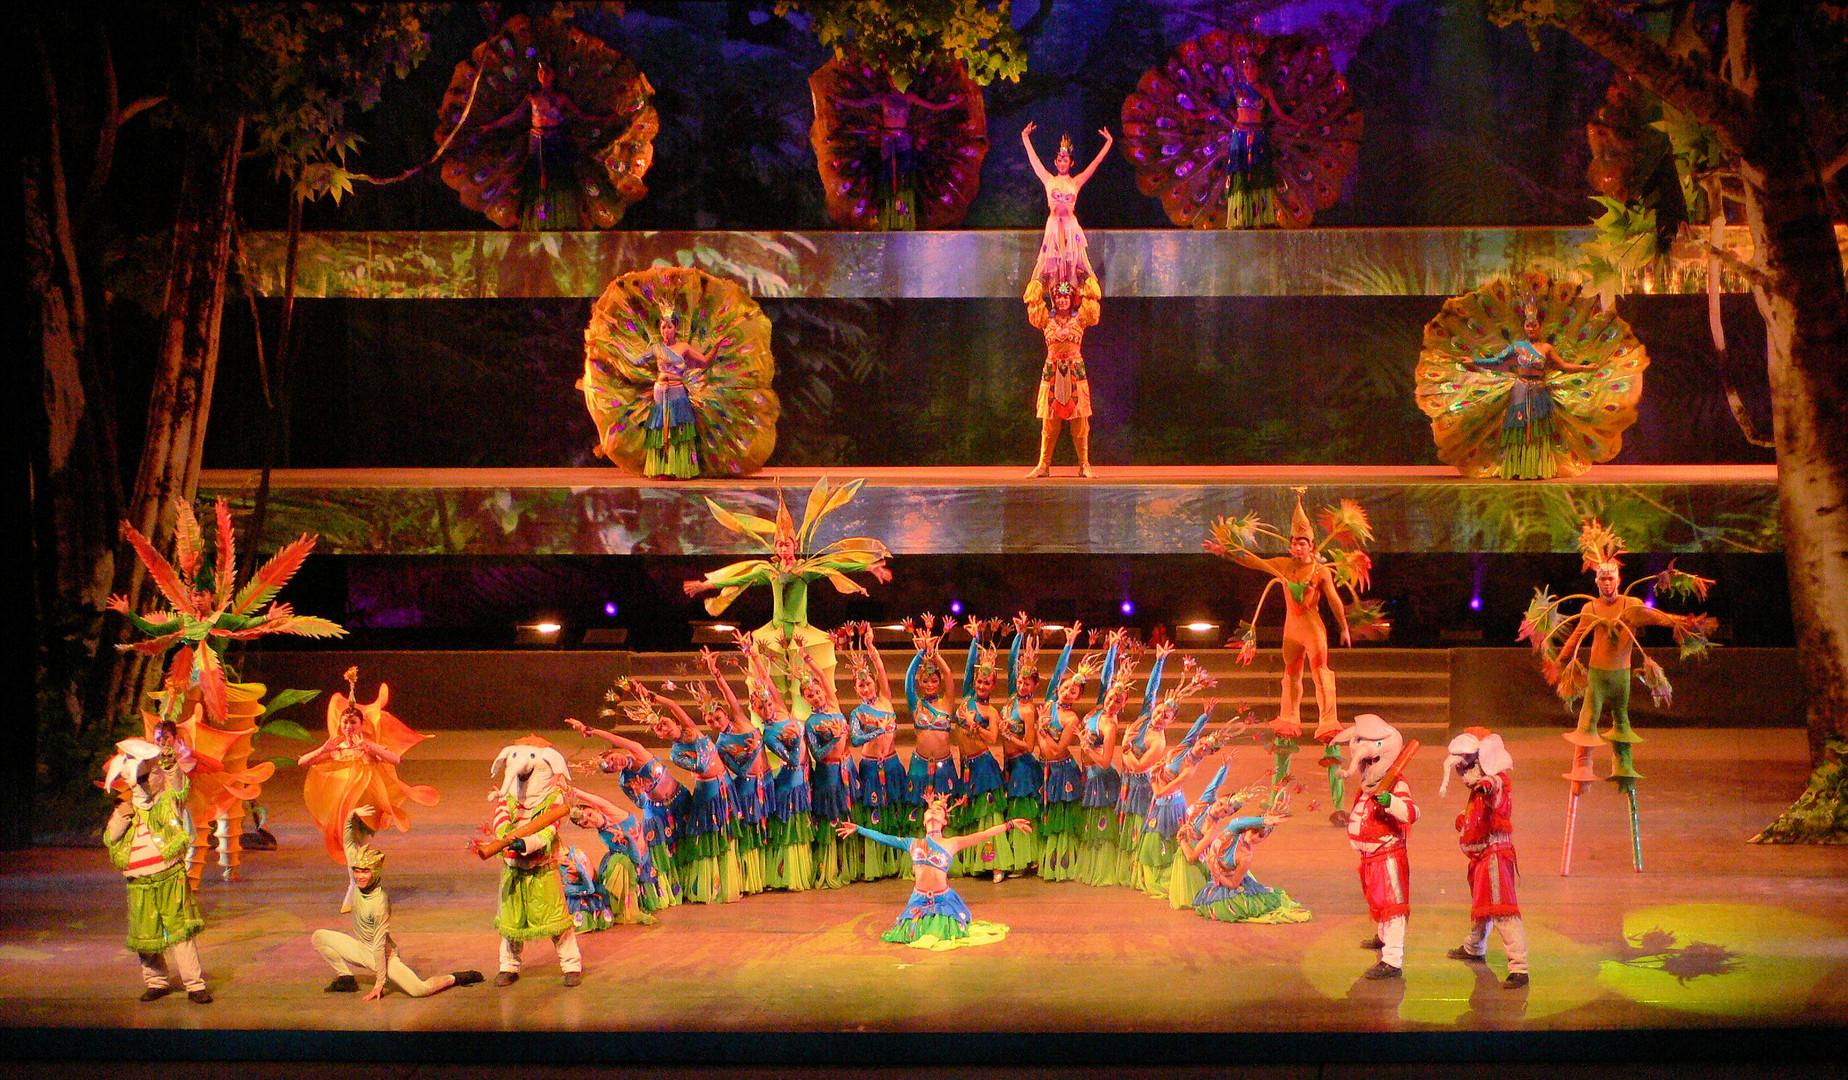 Bühnenshow in Jinghong 1